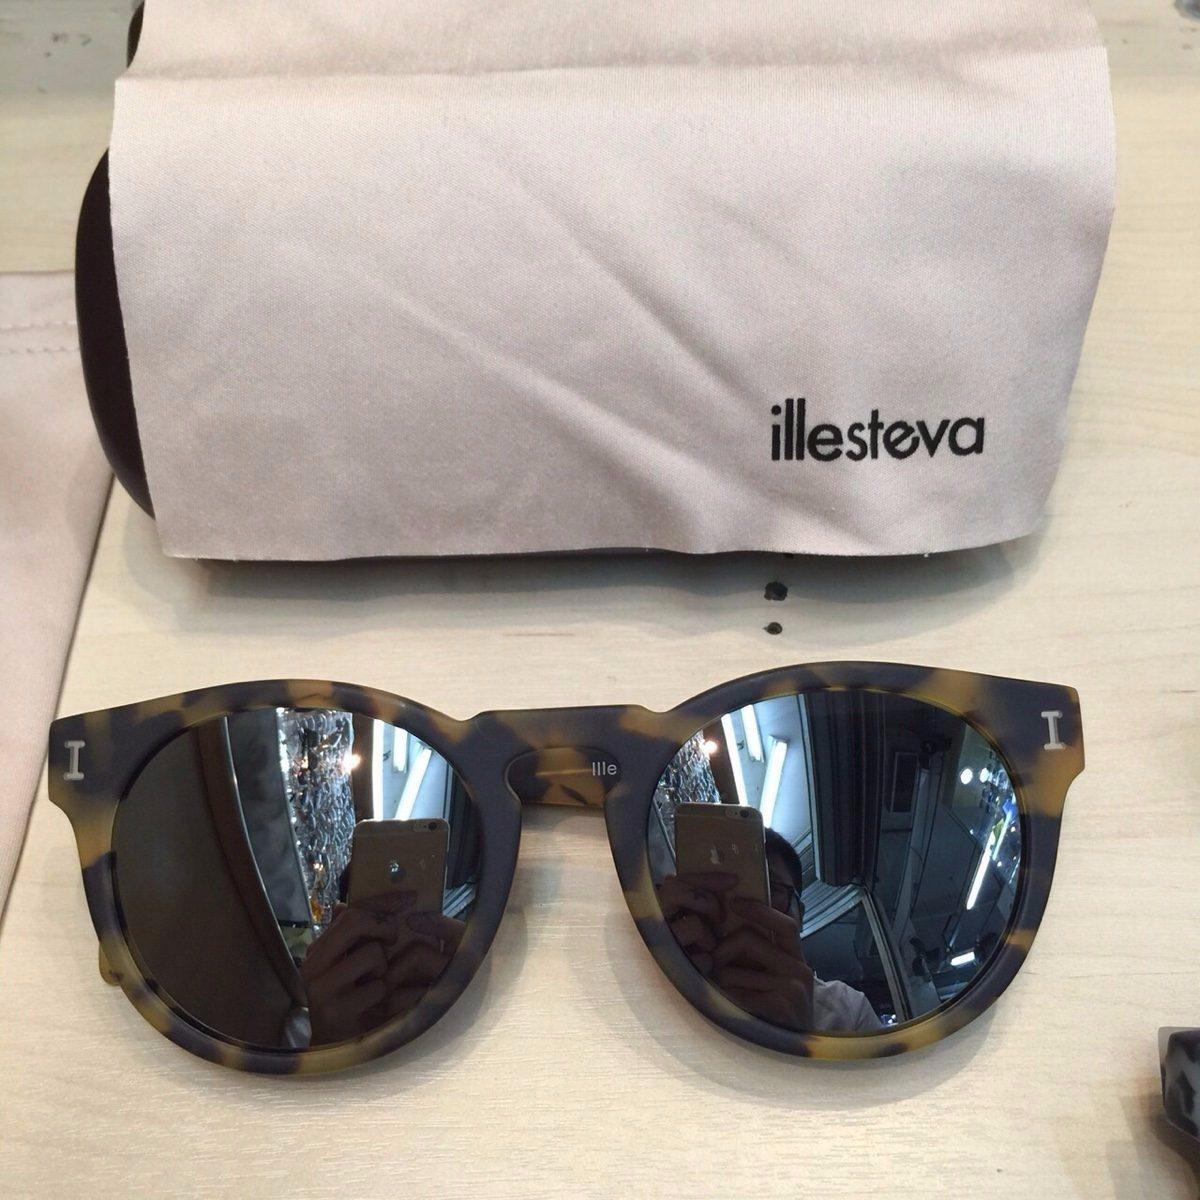 aea22ac3acd Oculos Illesteva Leonard I Original Espelhado - R  699